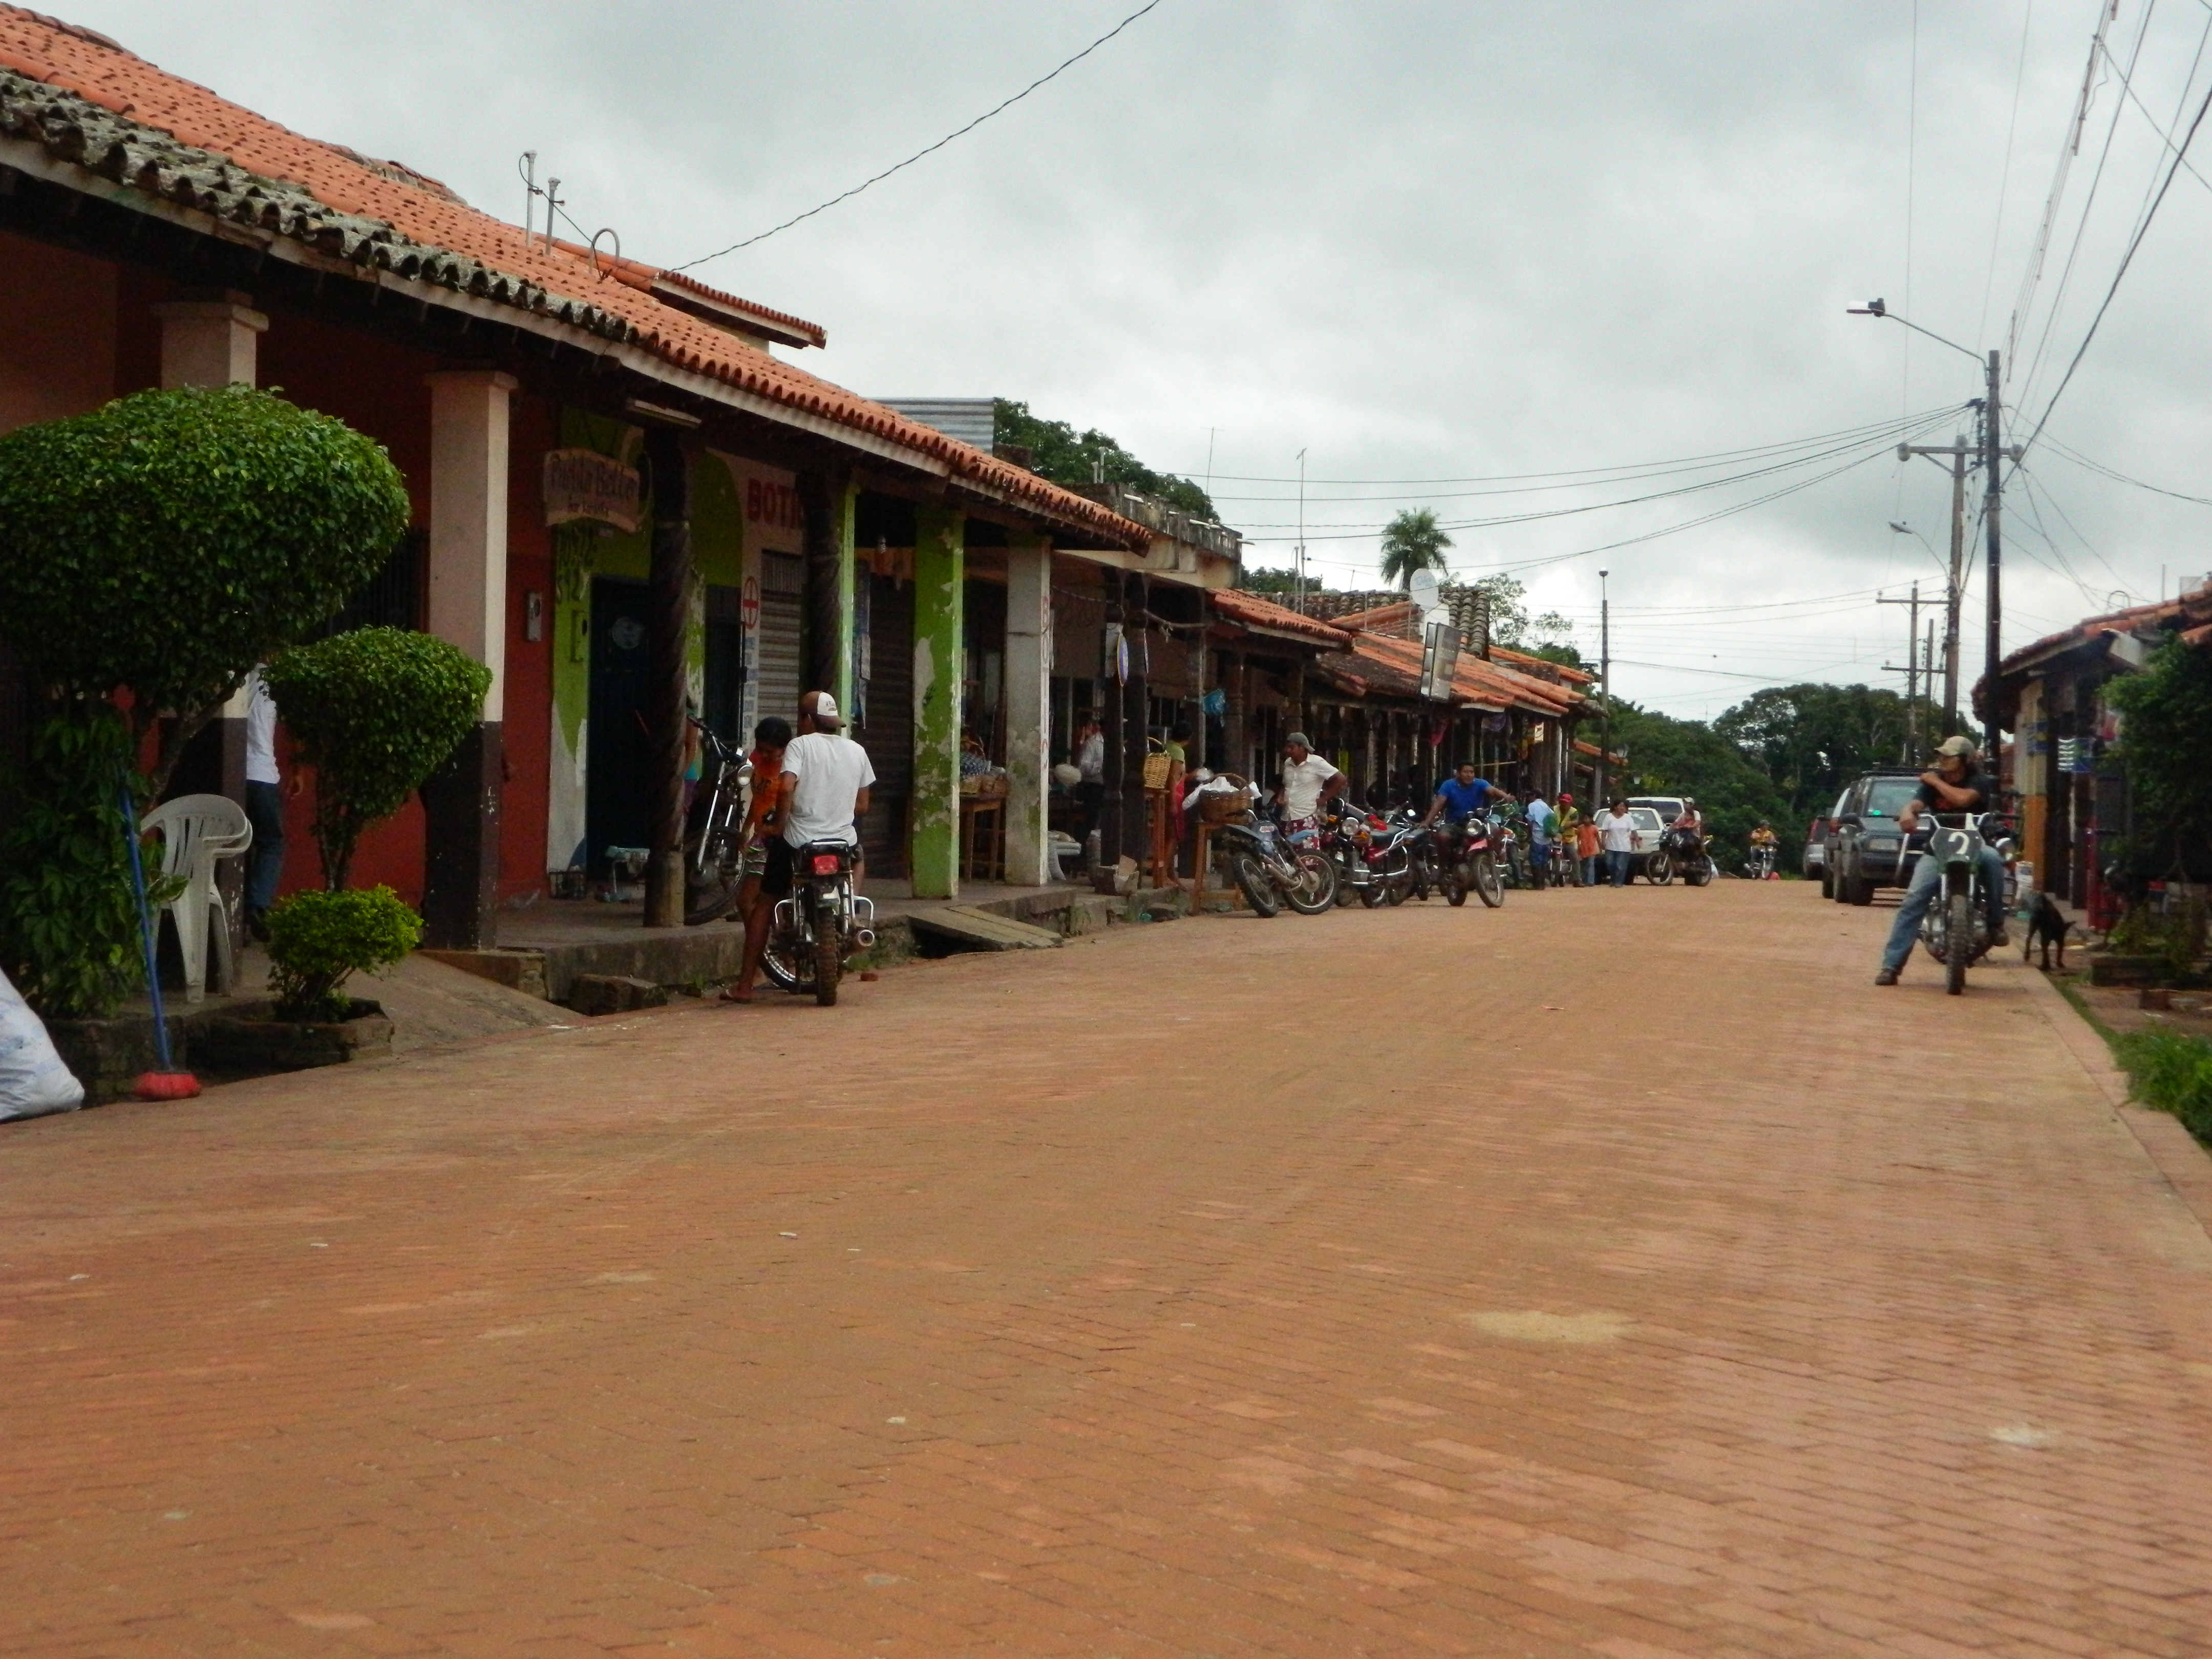 Avenida principal de Buenavista